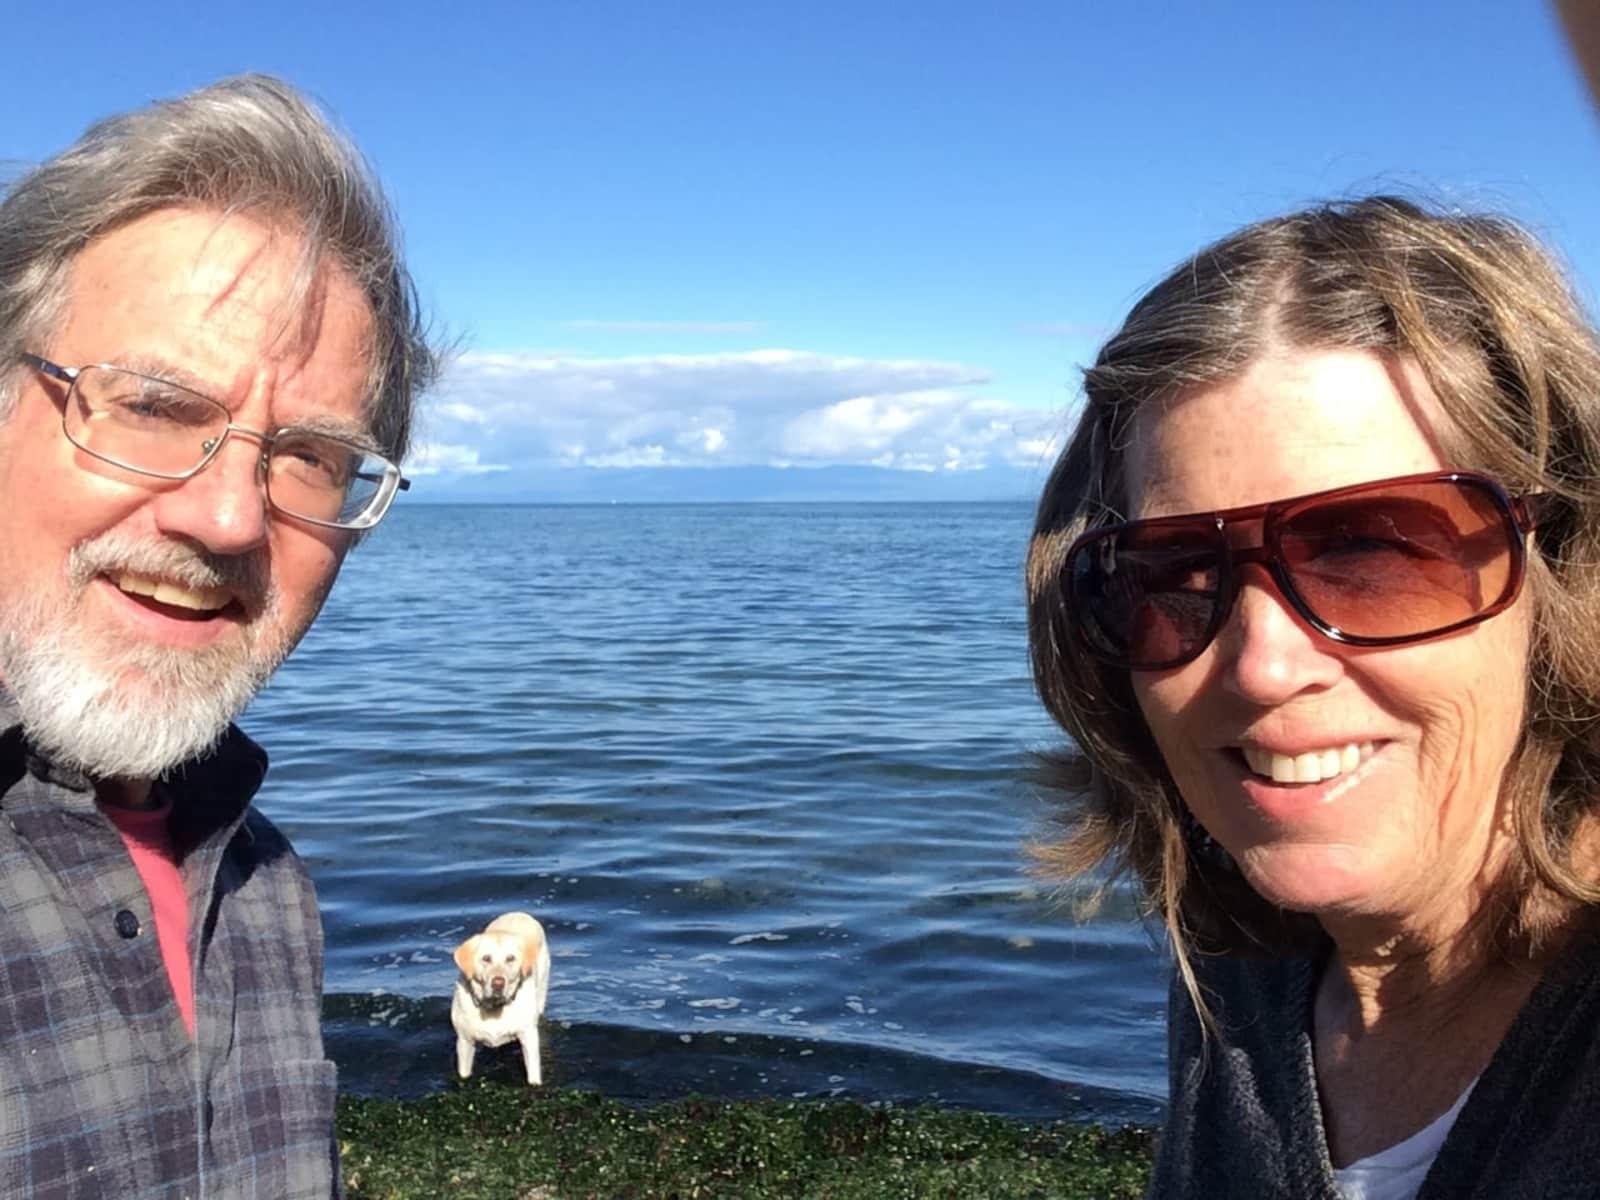 Judith & James from Comox, British Columbia, Canada